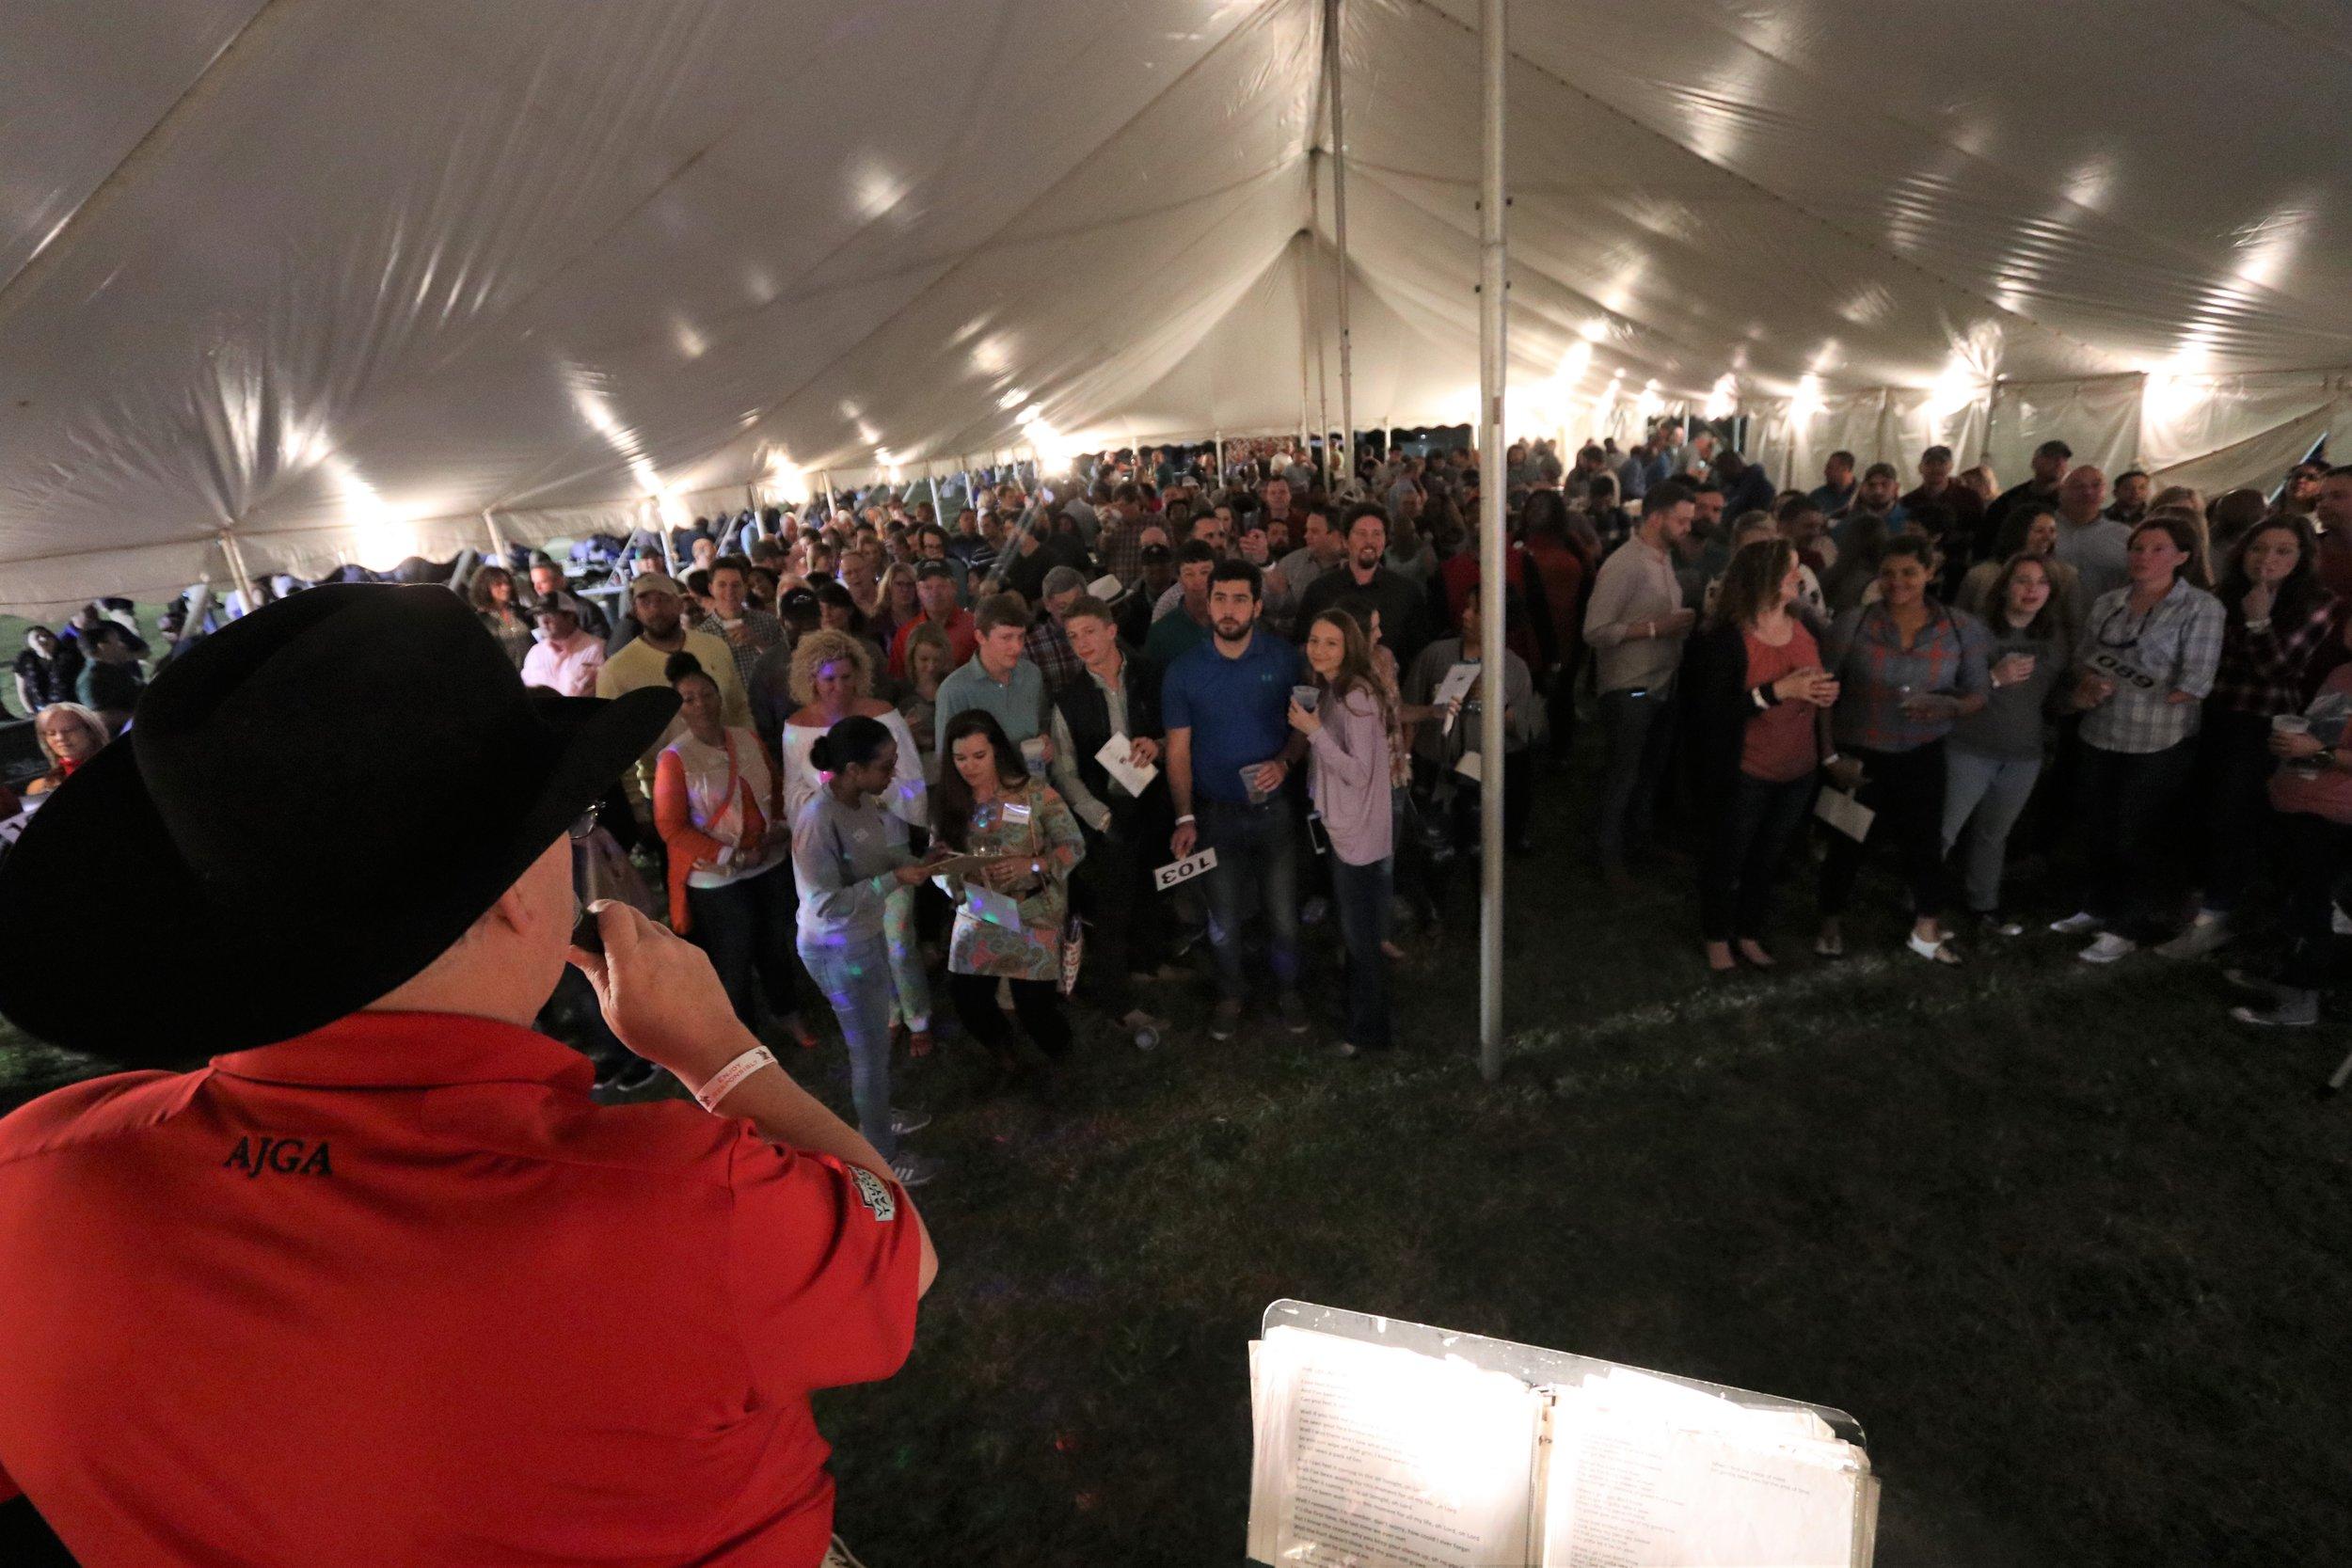 auction crowd2.JPG